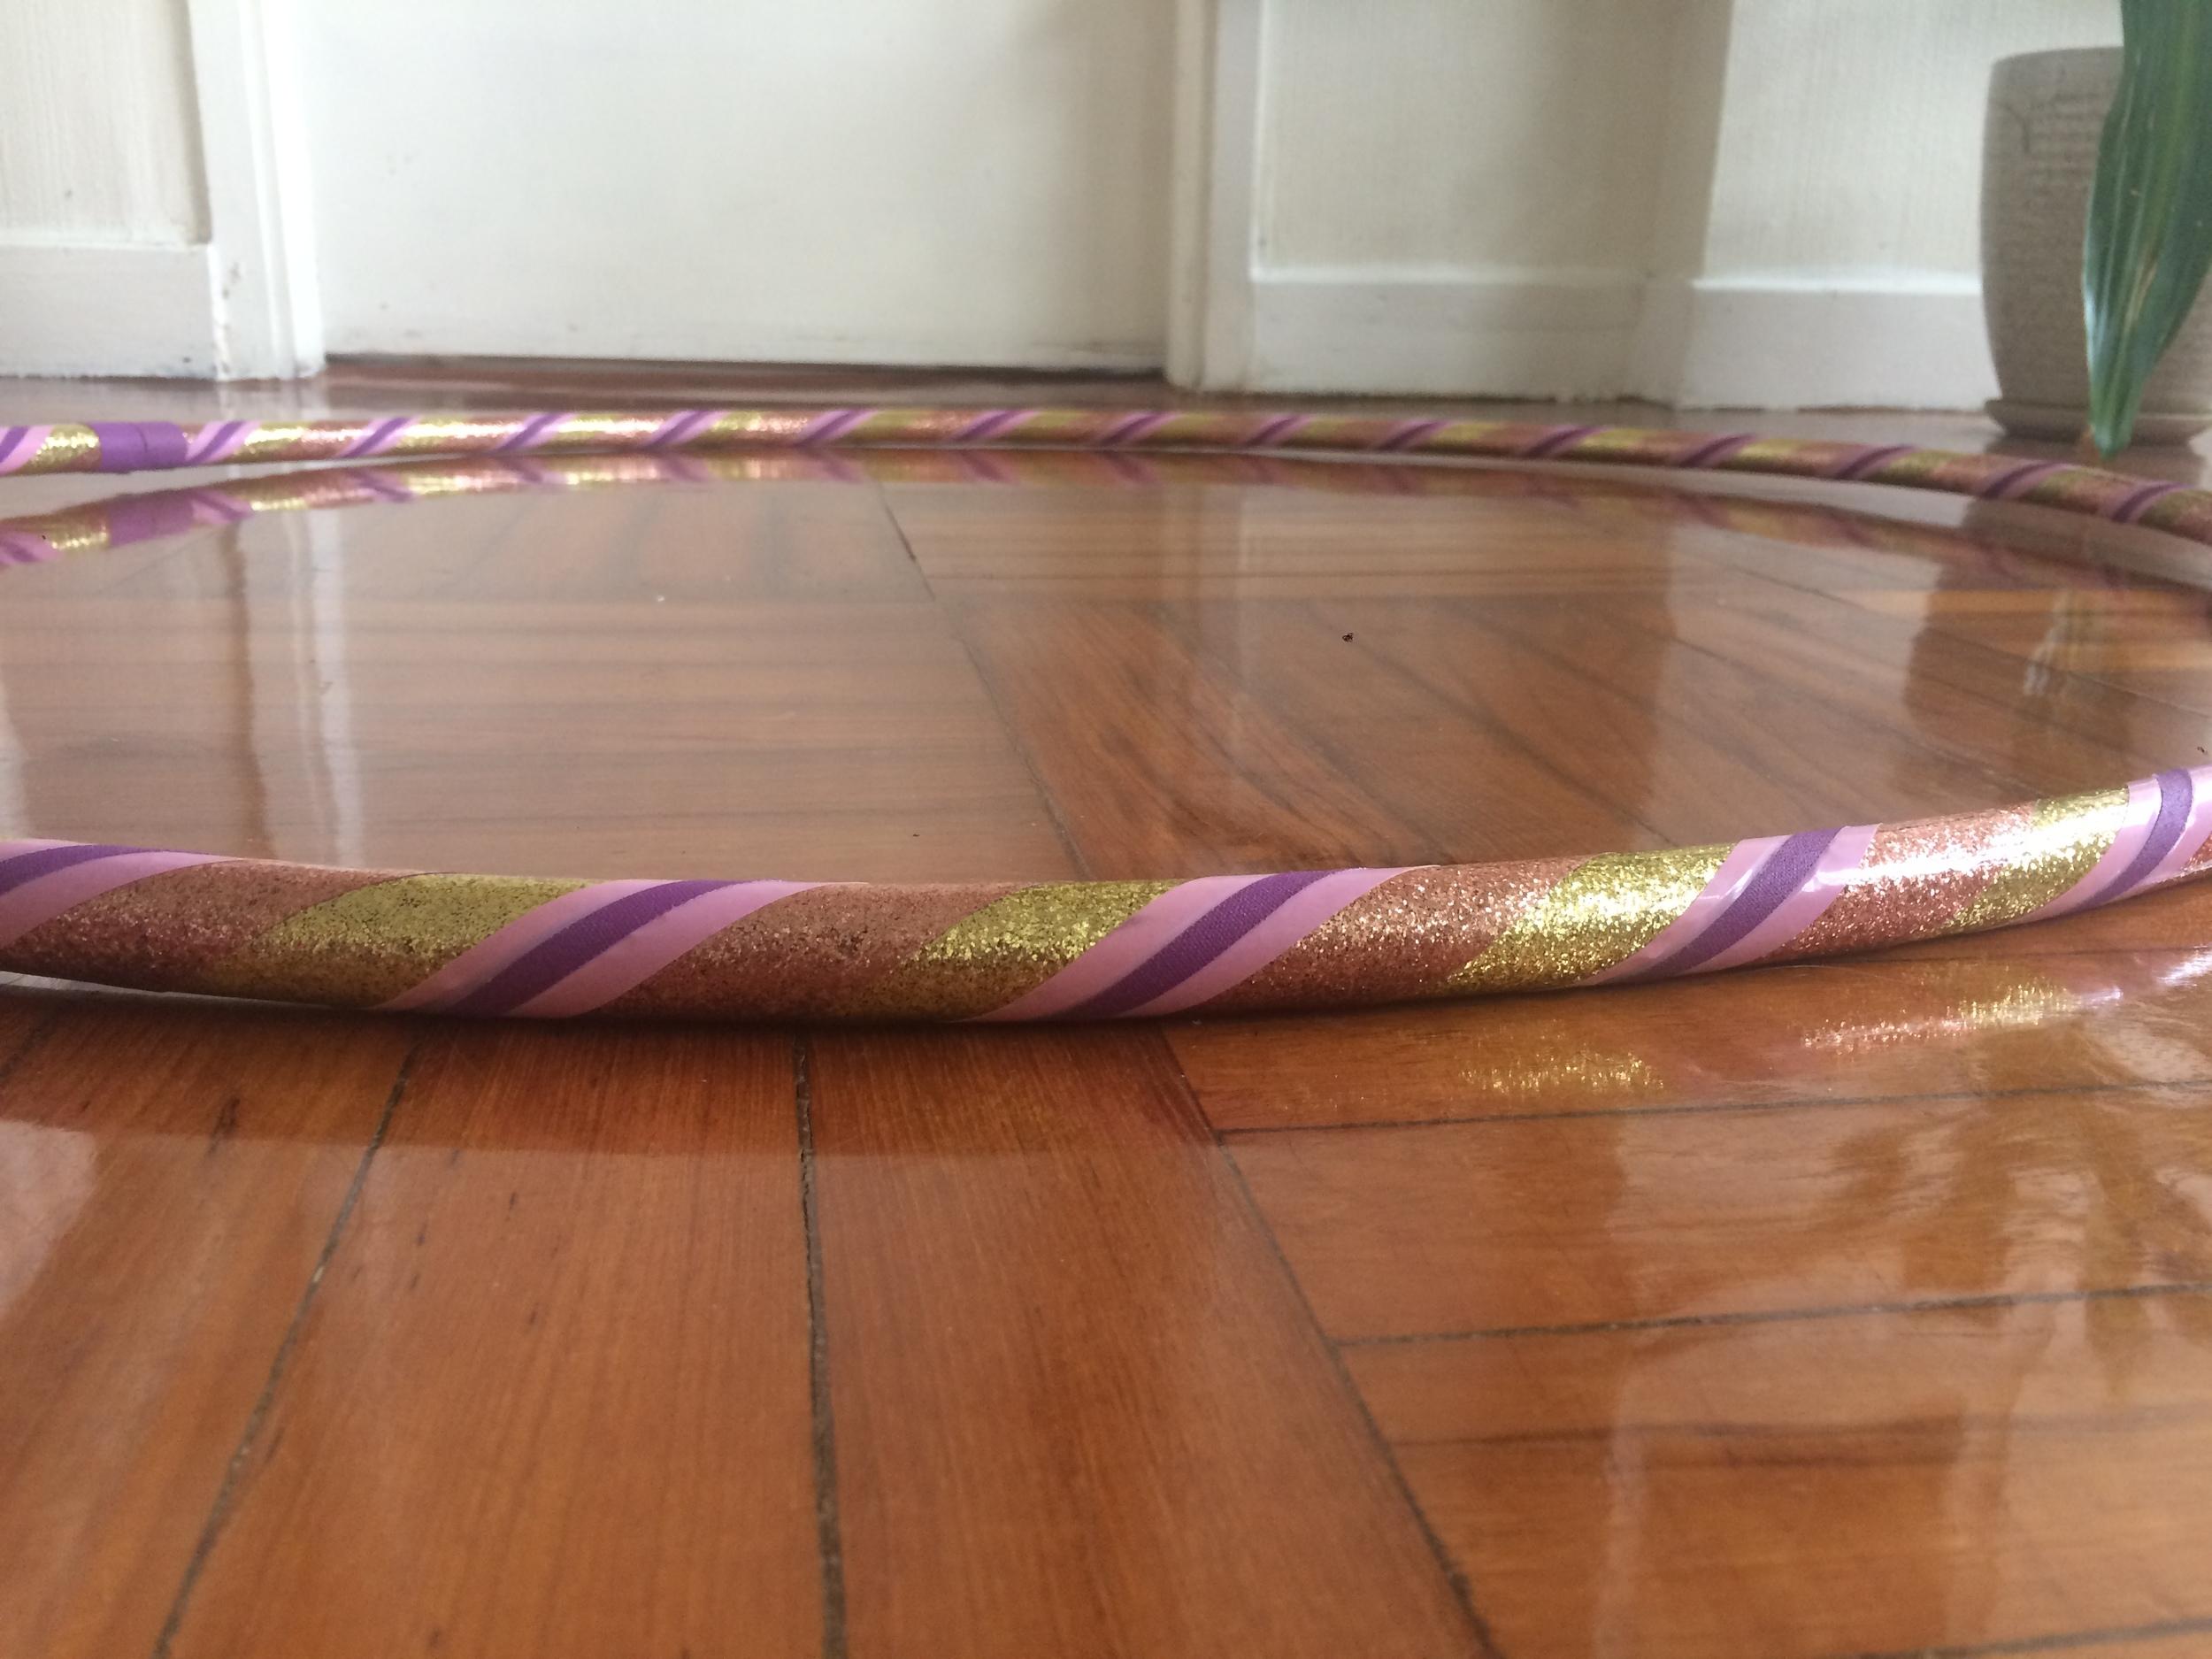 buy a hula hoop hong kong 香港呼啦圈定制